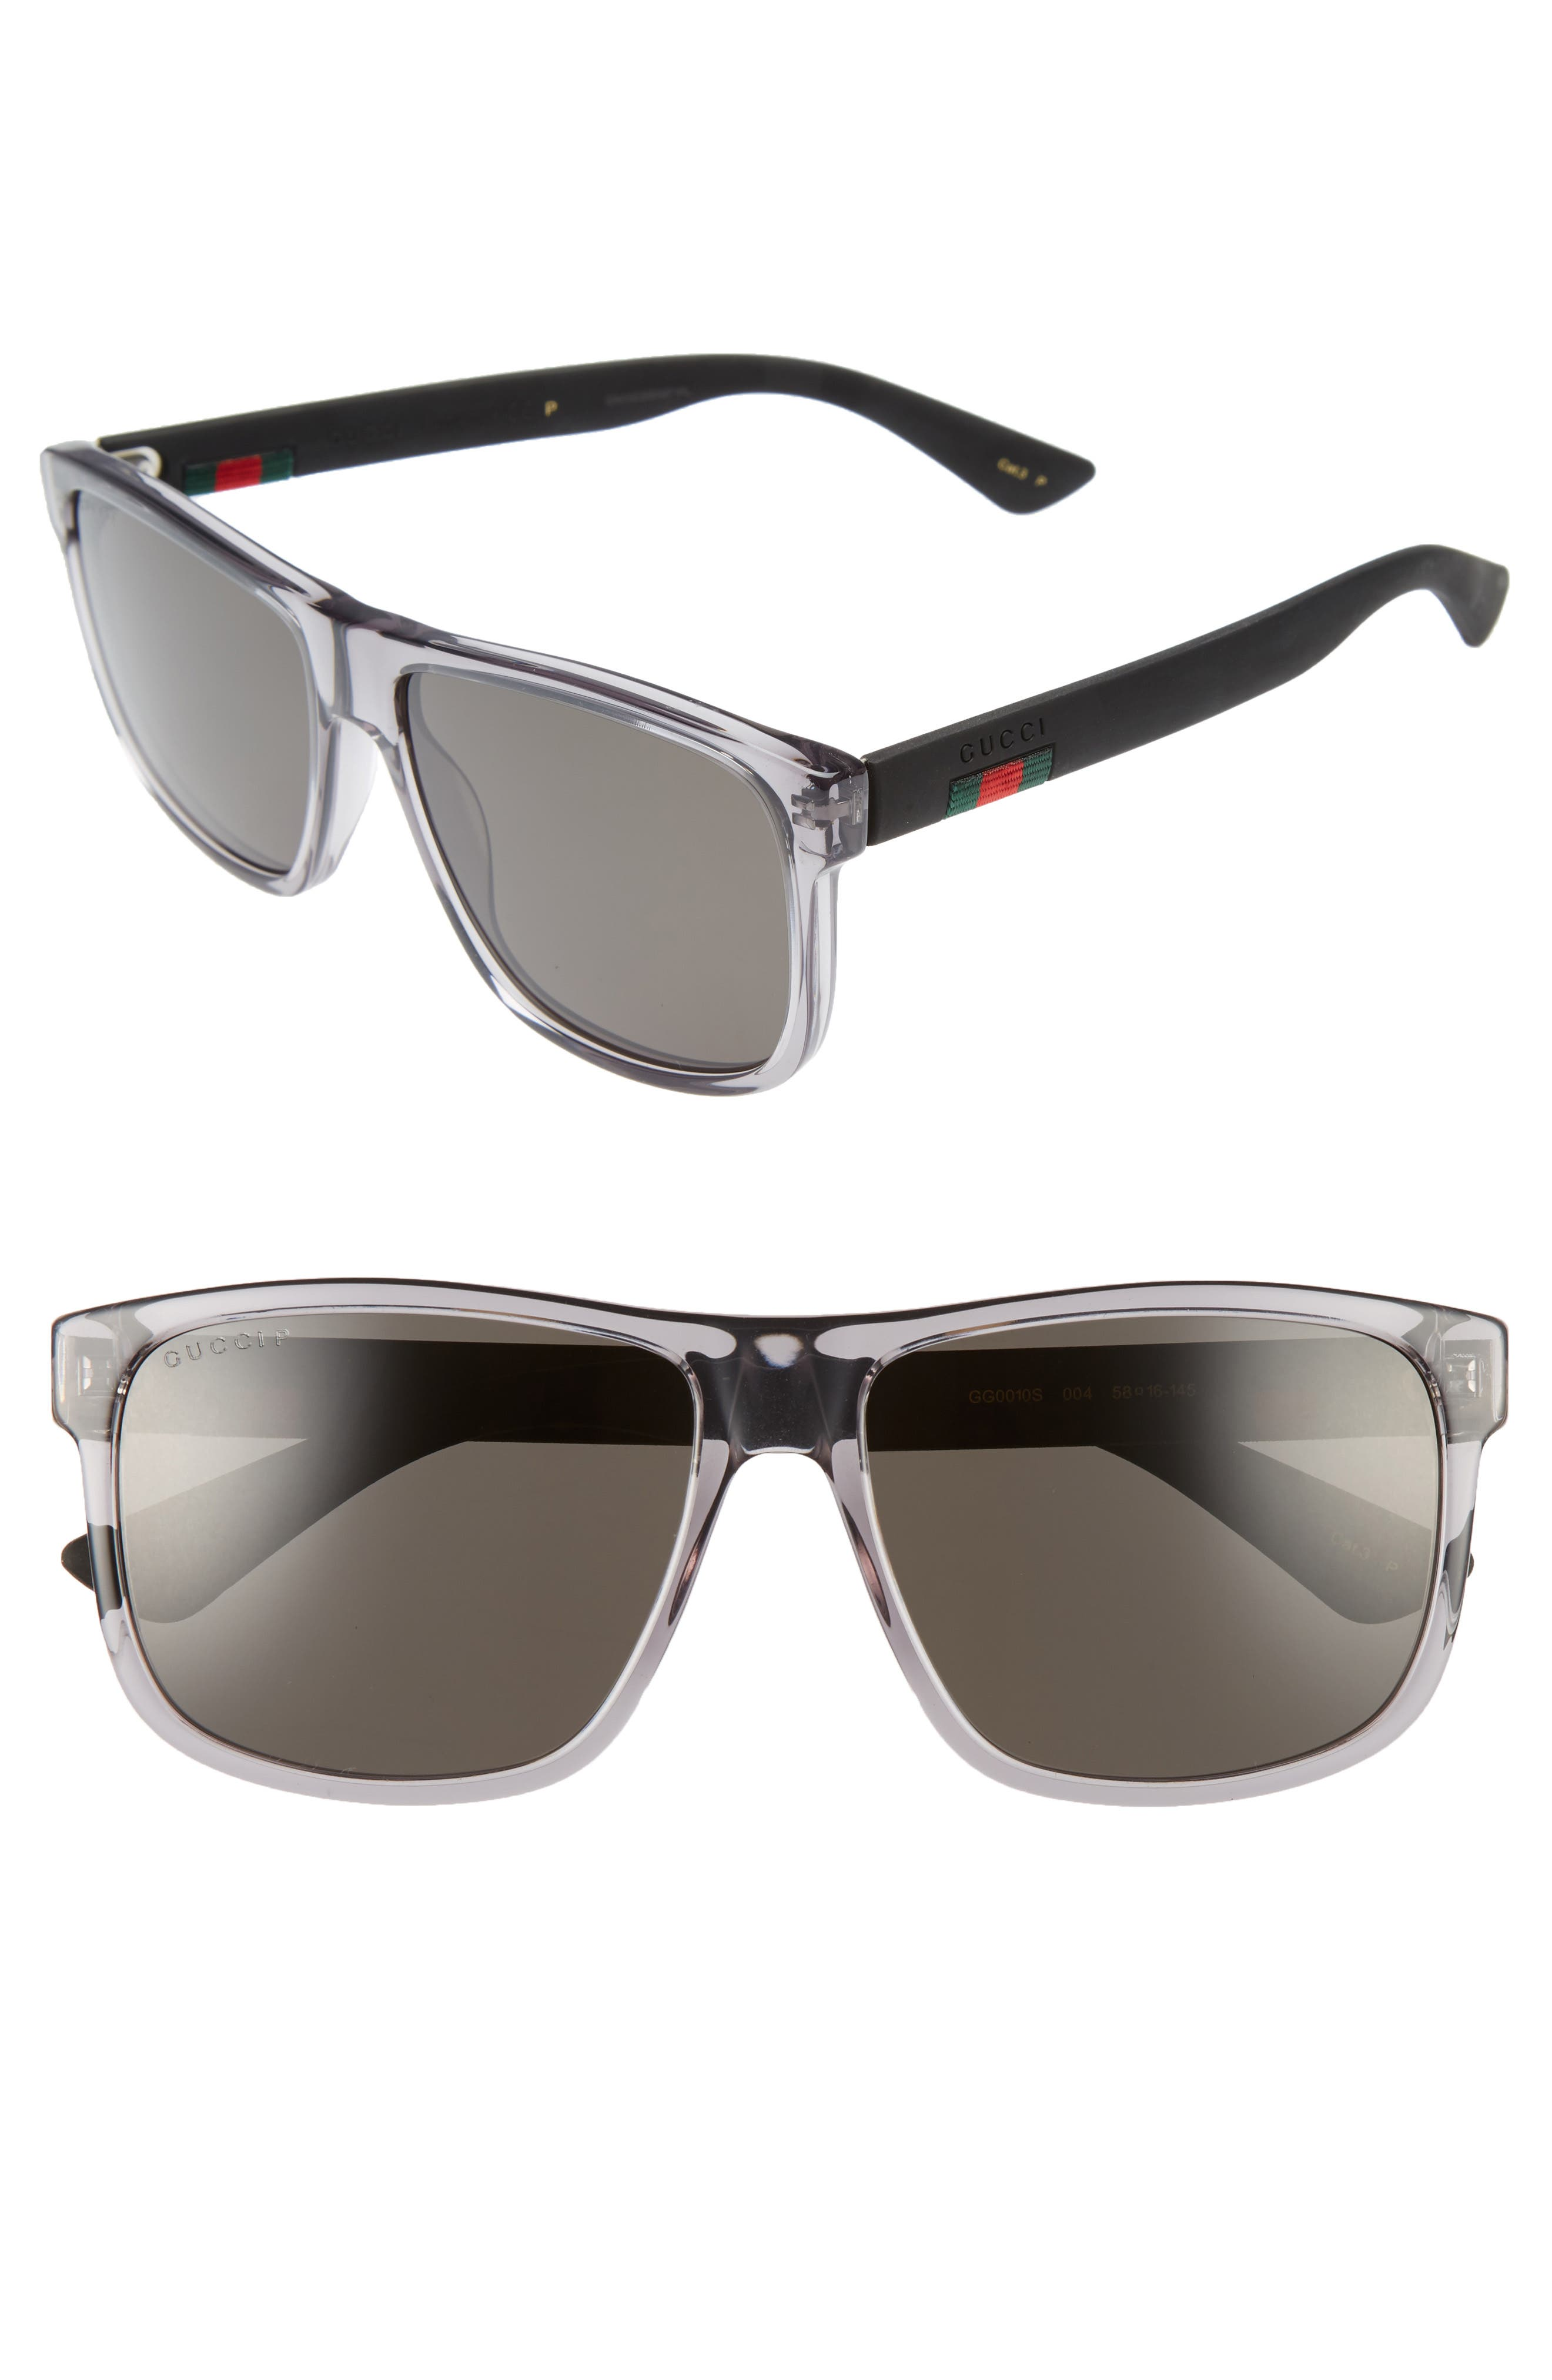 GUCCI, 58mm Polarized Sunglasses, Main thumbnail 1, color, TRANSPARENT GREY W/ GREY PLR